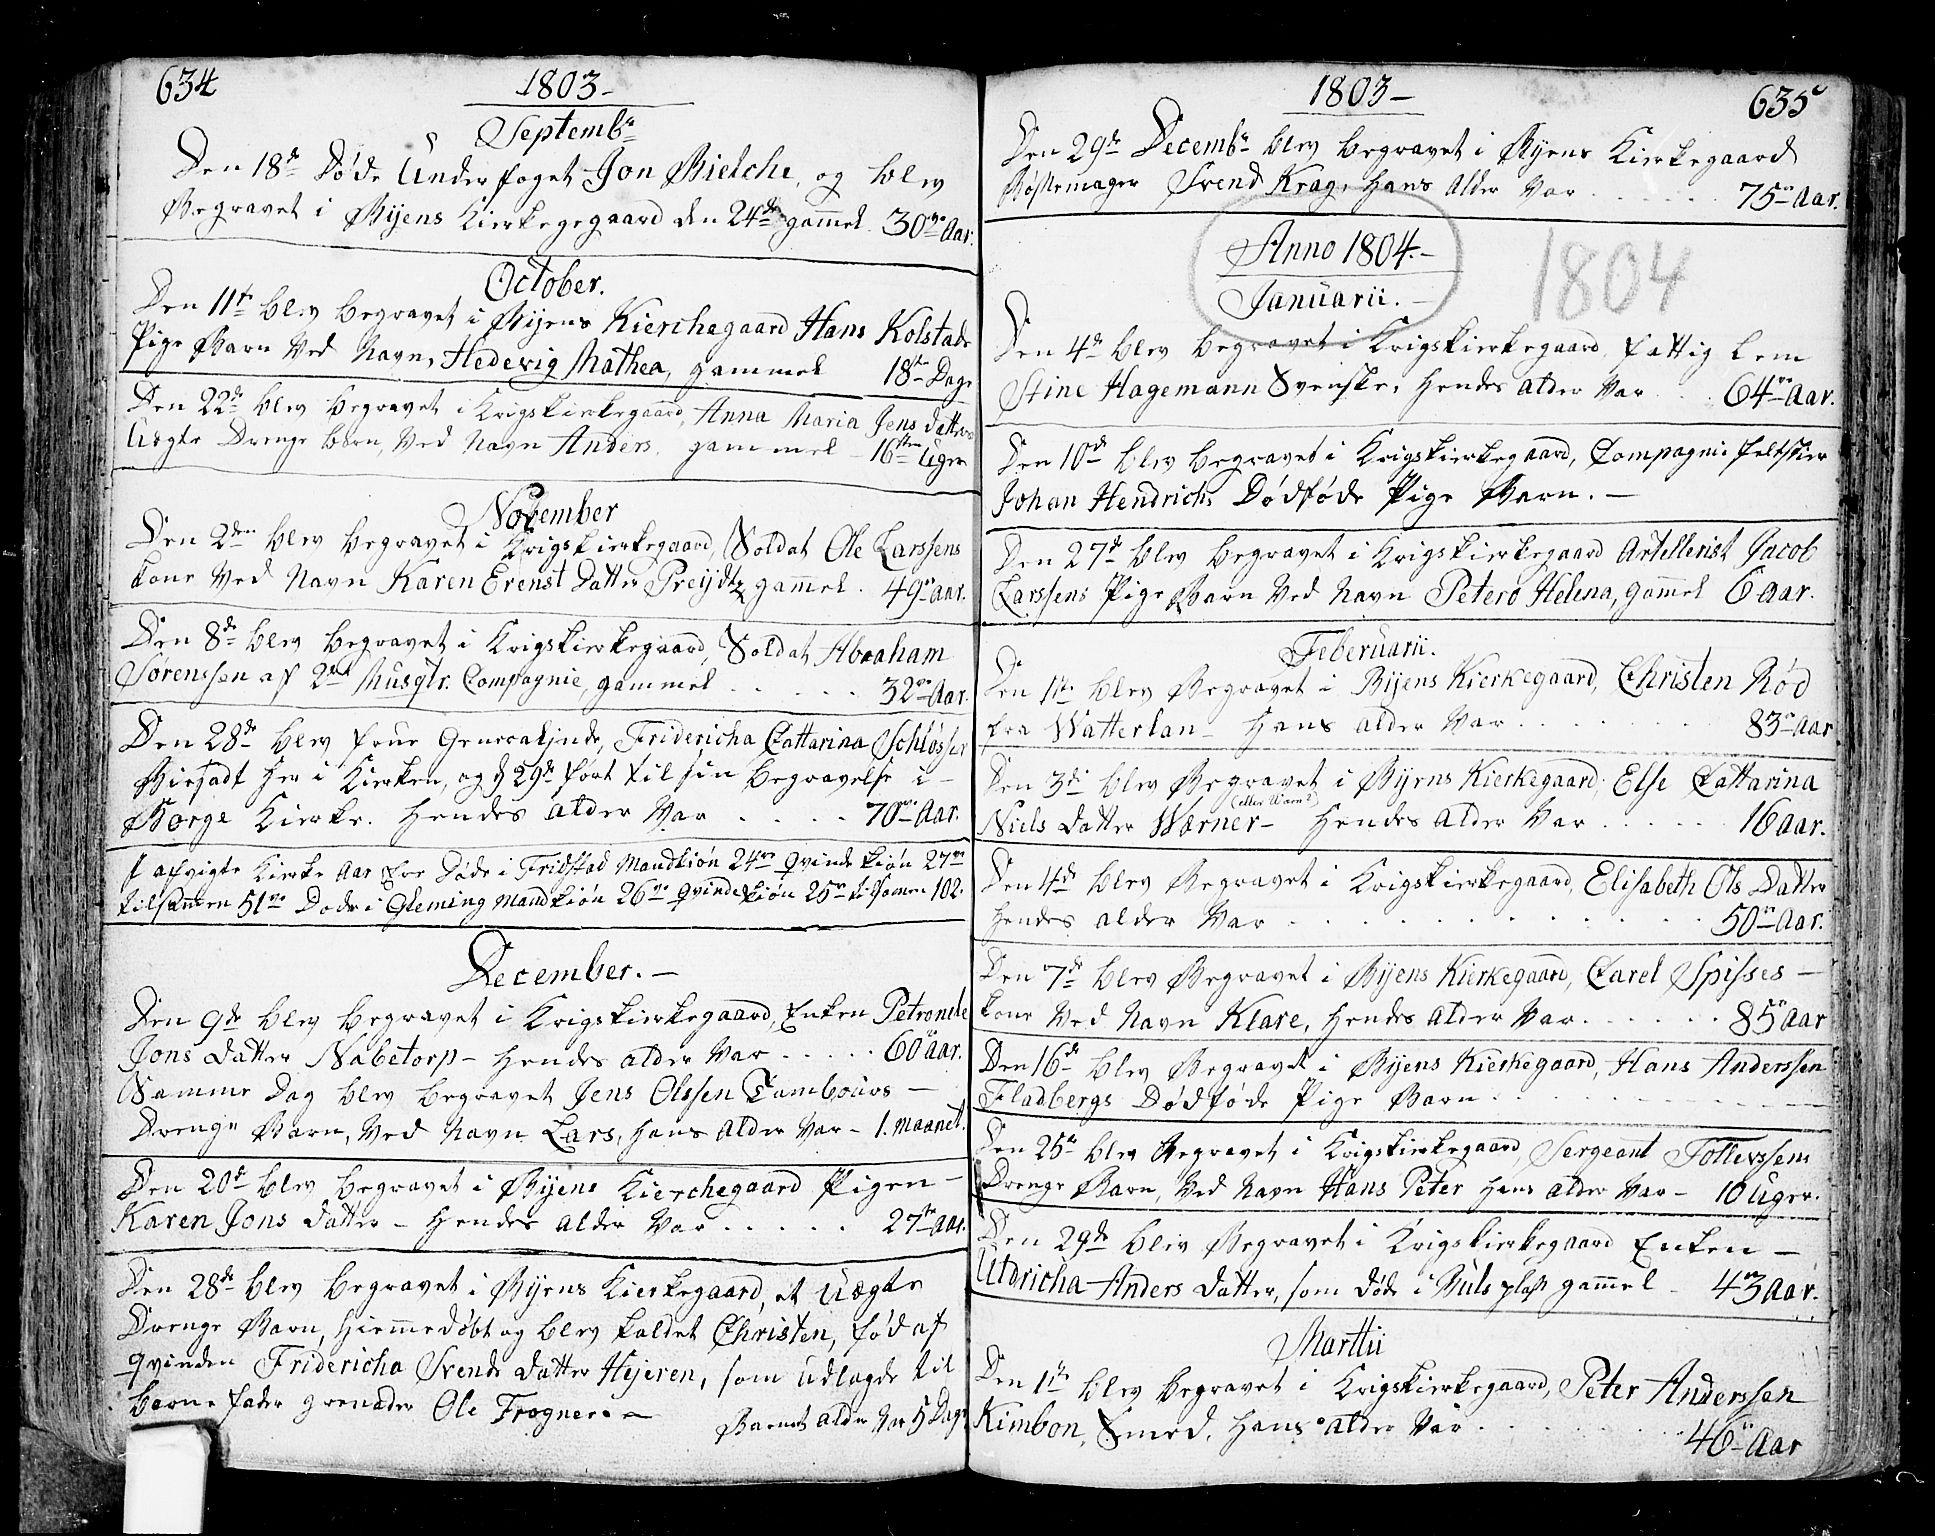 SAO, Fredrikstad prestekontor Kirkebøker, F/Fa/L0002: Ministerialbok nr. 2, 1750-1804, s. 634-635